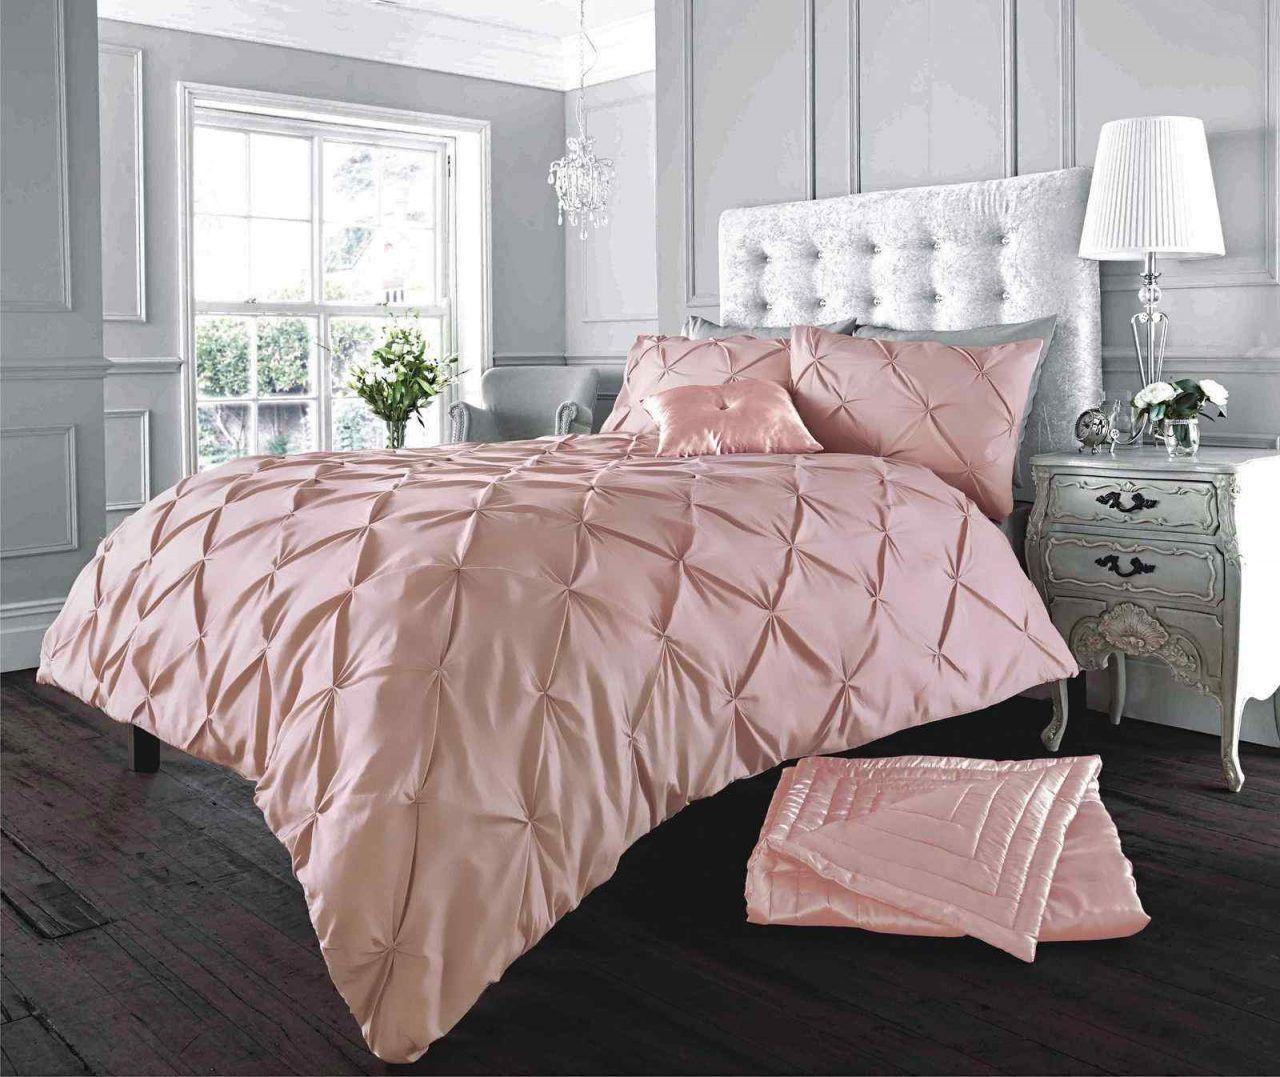 Stylish Alford Soft Pink Duvet Quilt Cover Set Duvet Bedding Duvet Cover Sets Bed Duvet Covers